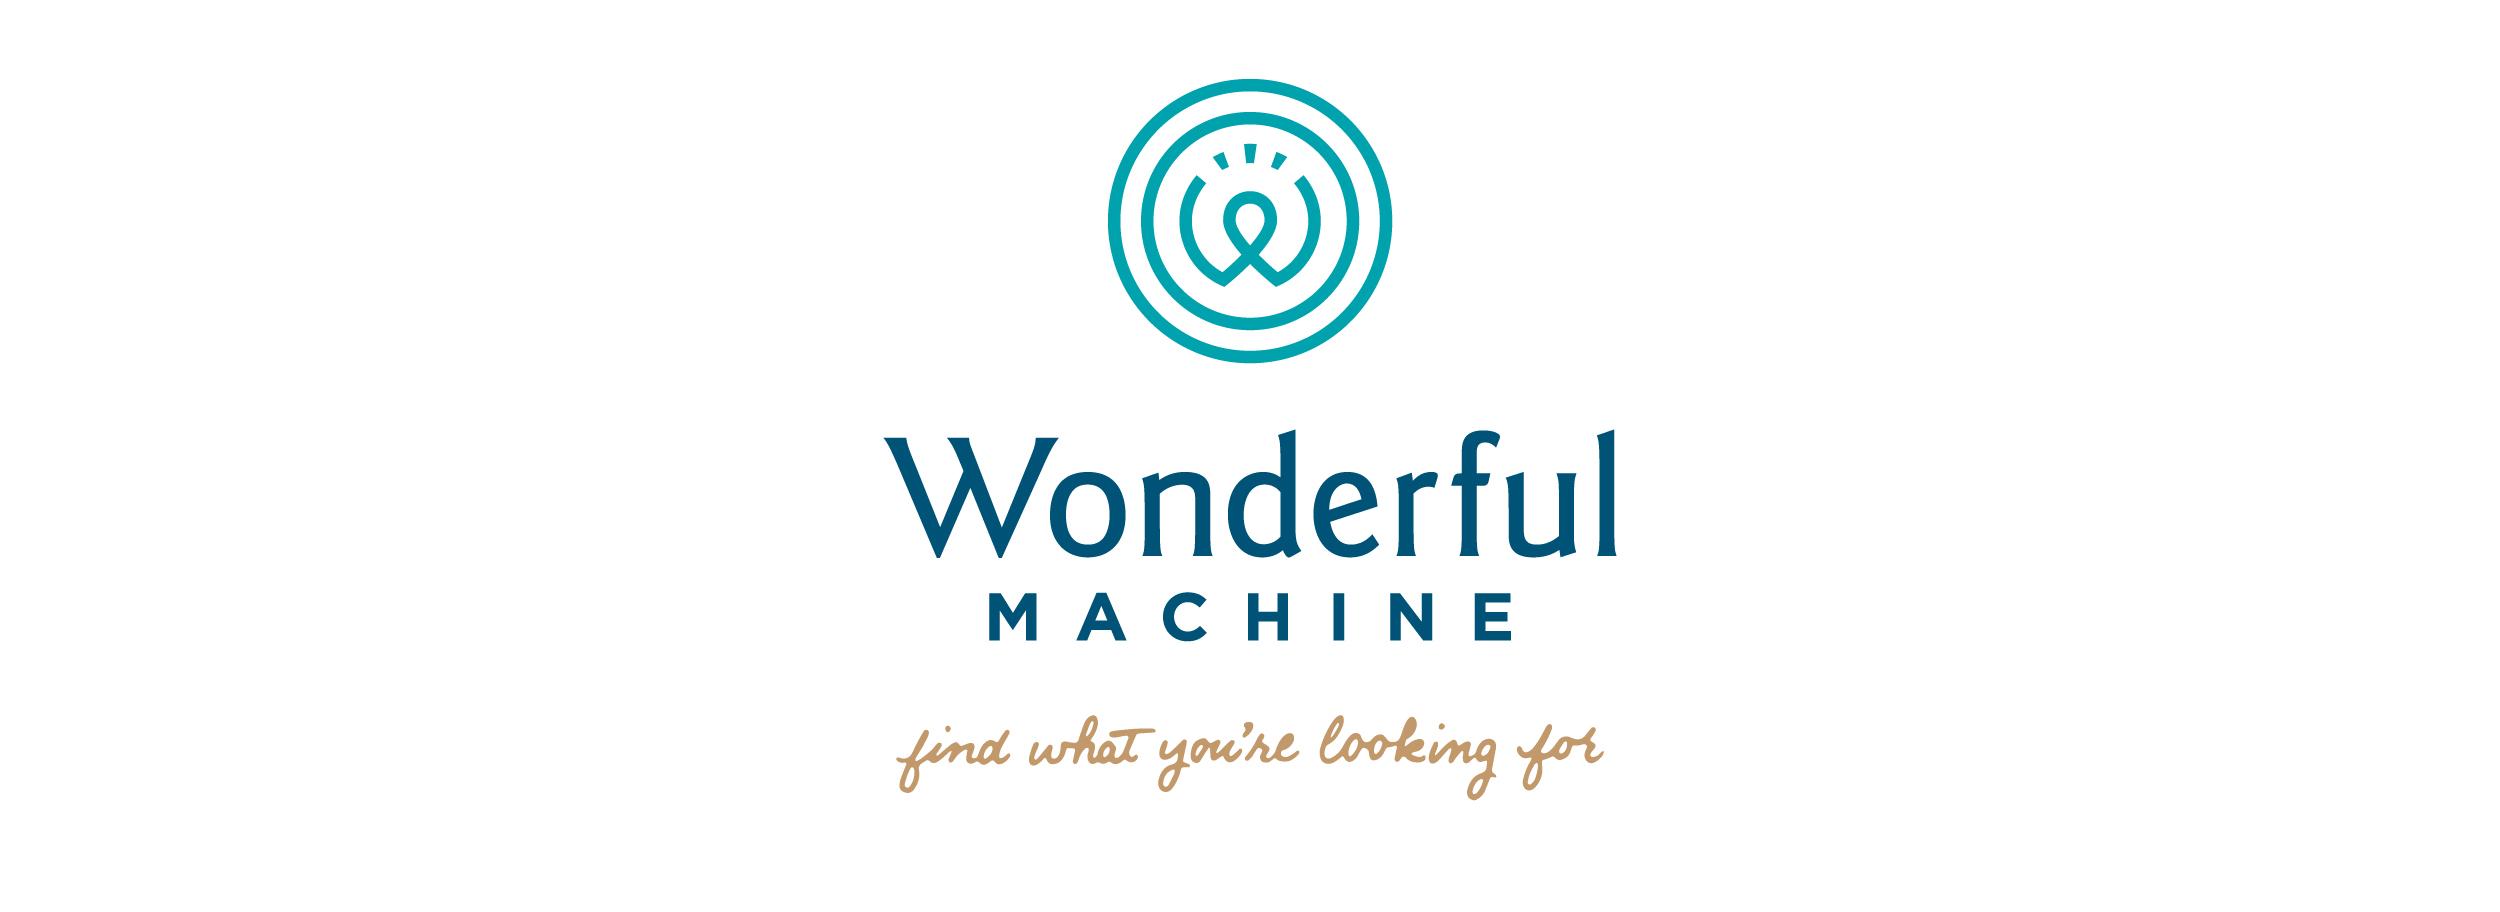 Wonderful_Machine_Logo_2018.jpg